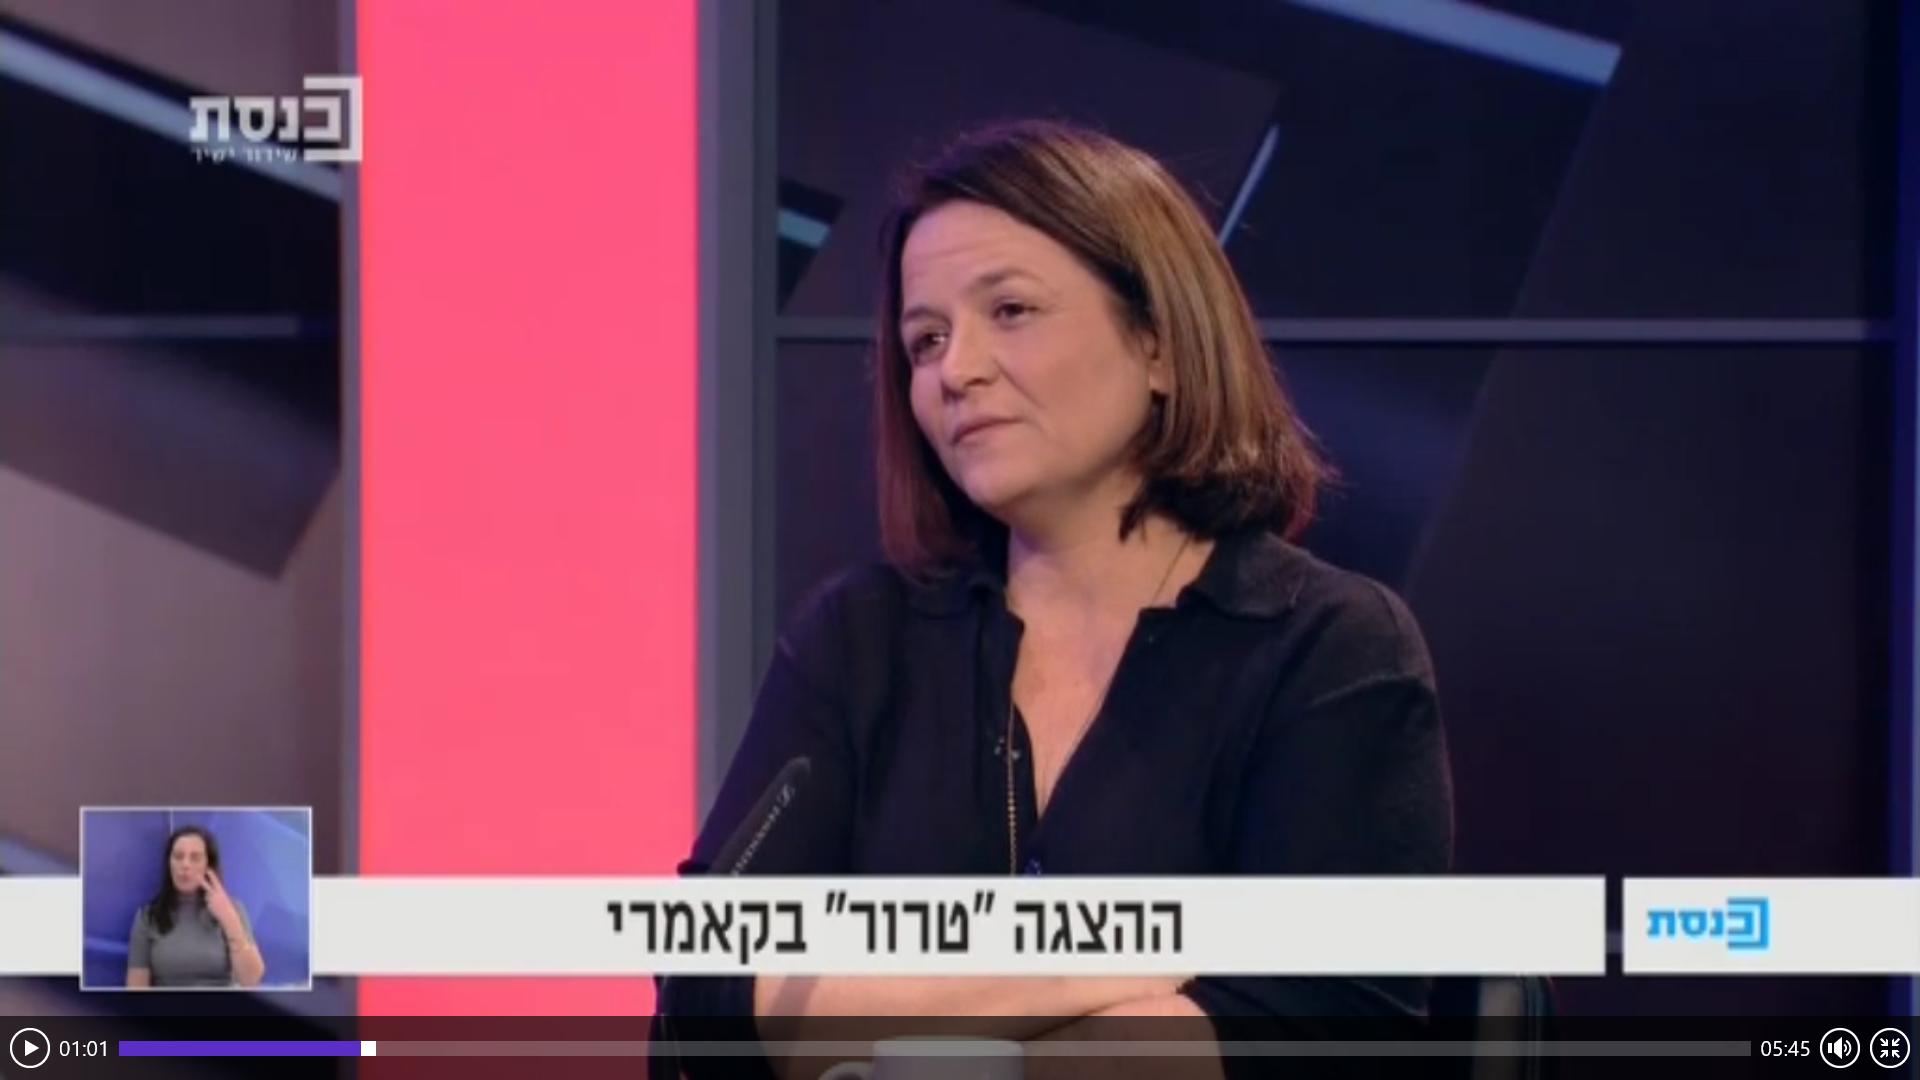 Knesset Chanl - ראיון בערוץ הכנסת